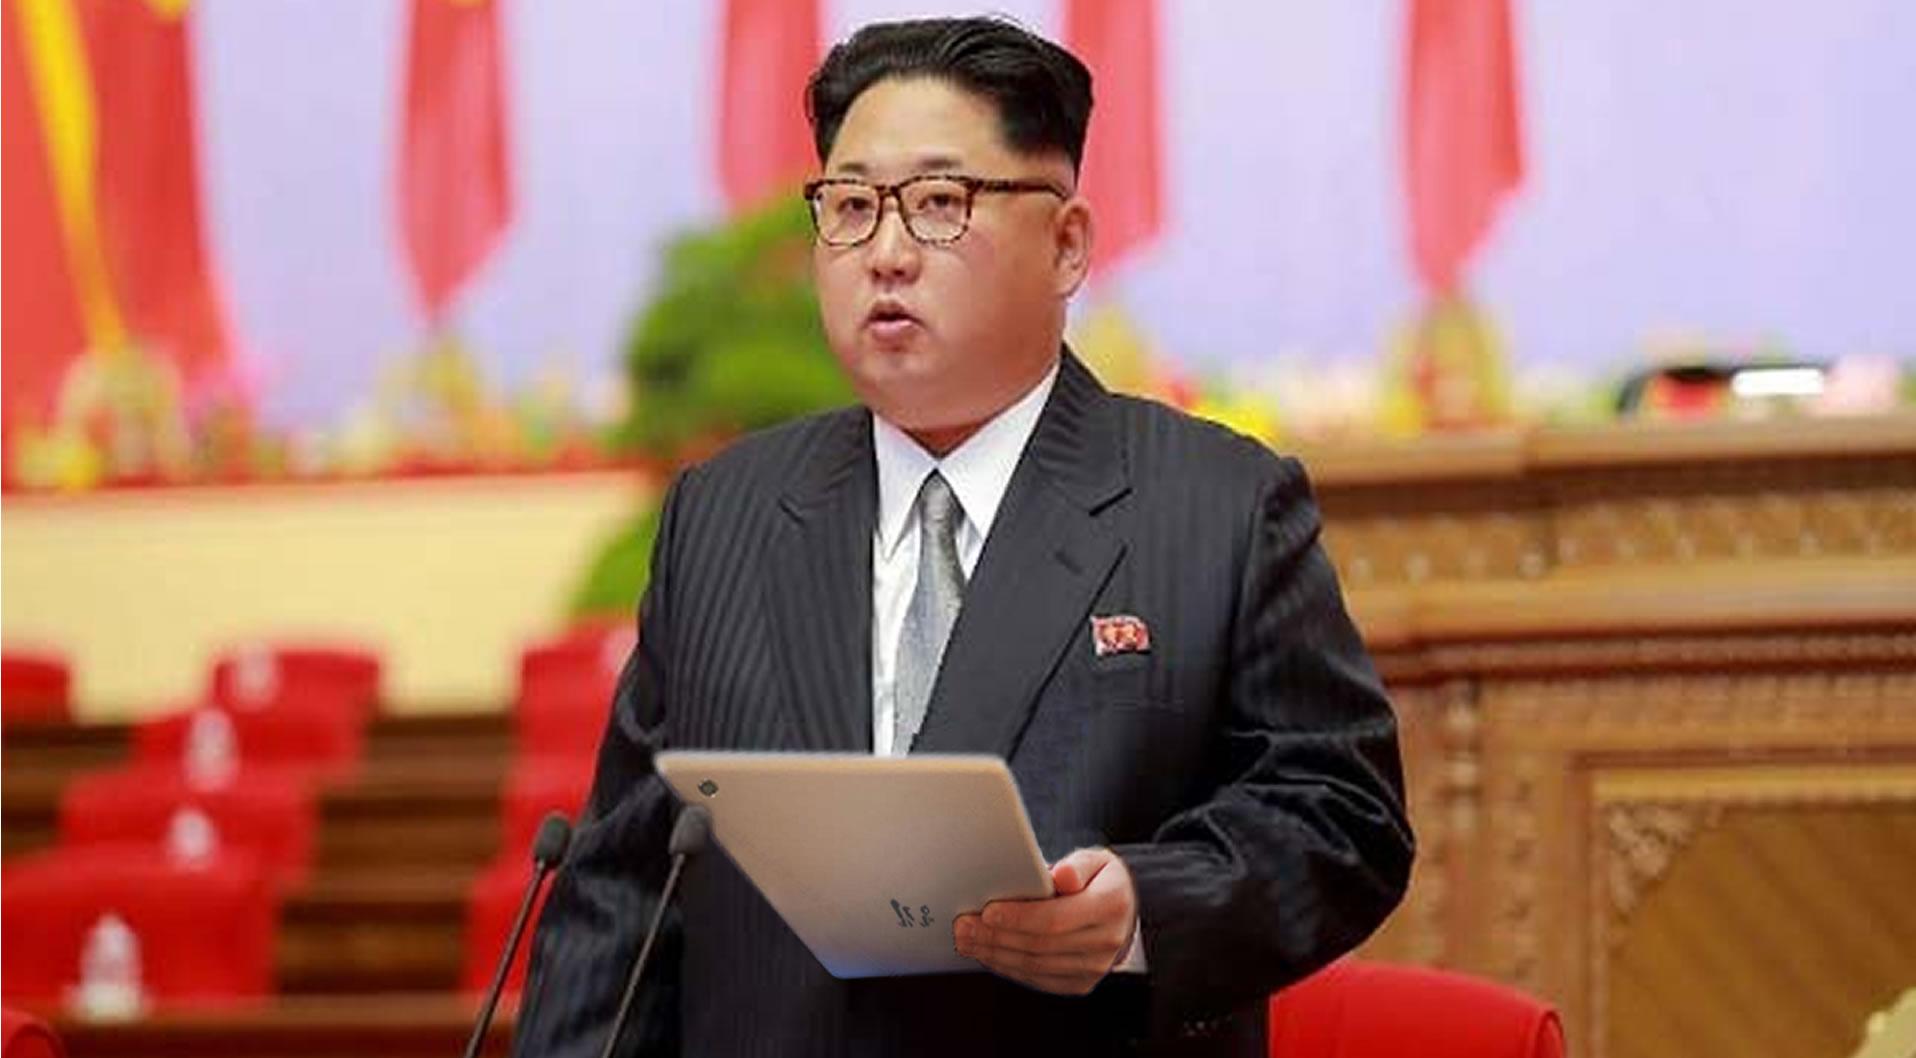 Kim Jong Un mit Tablet-PC